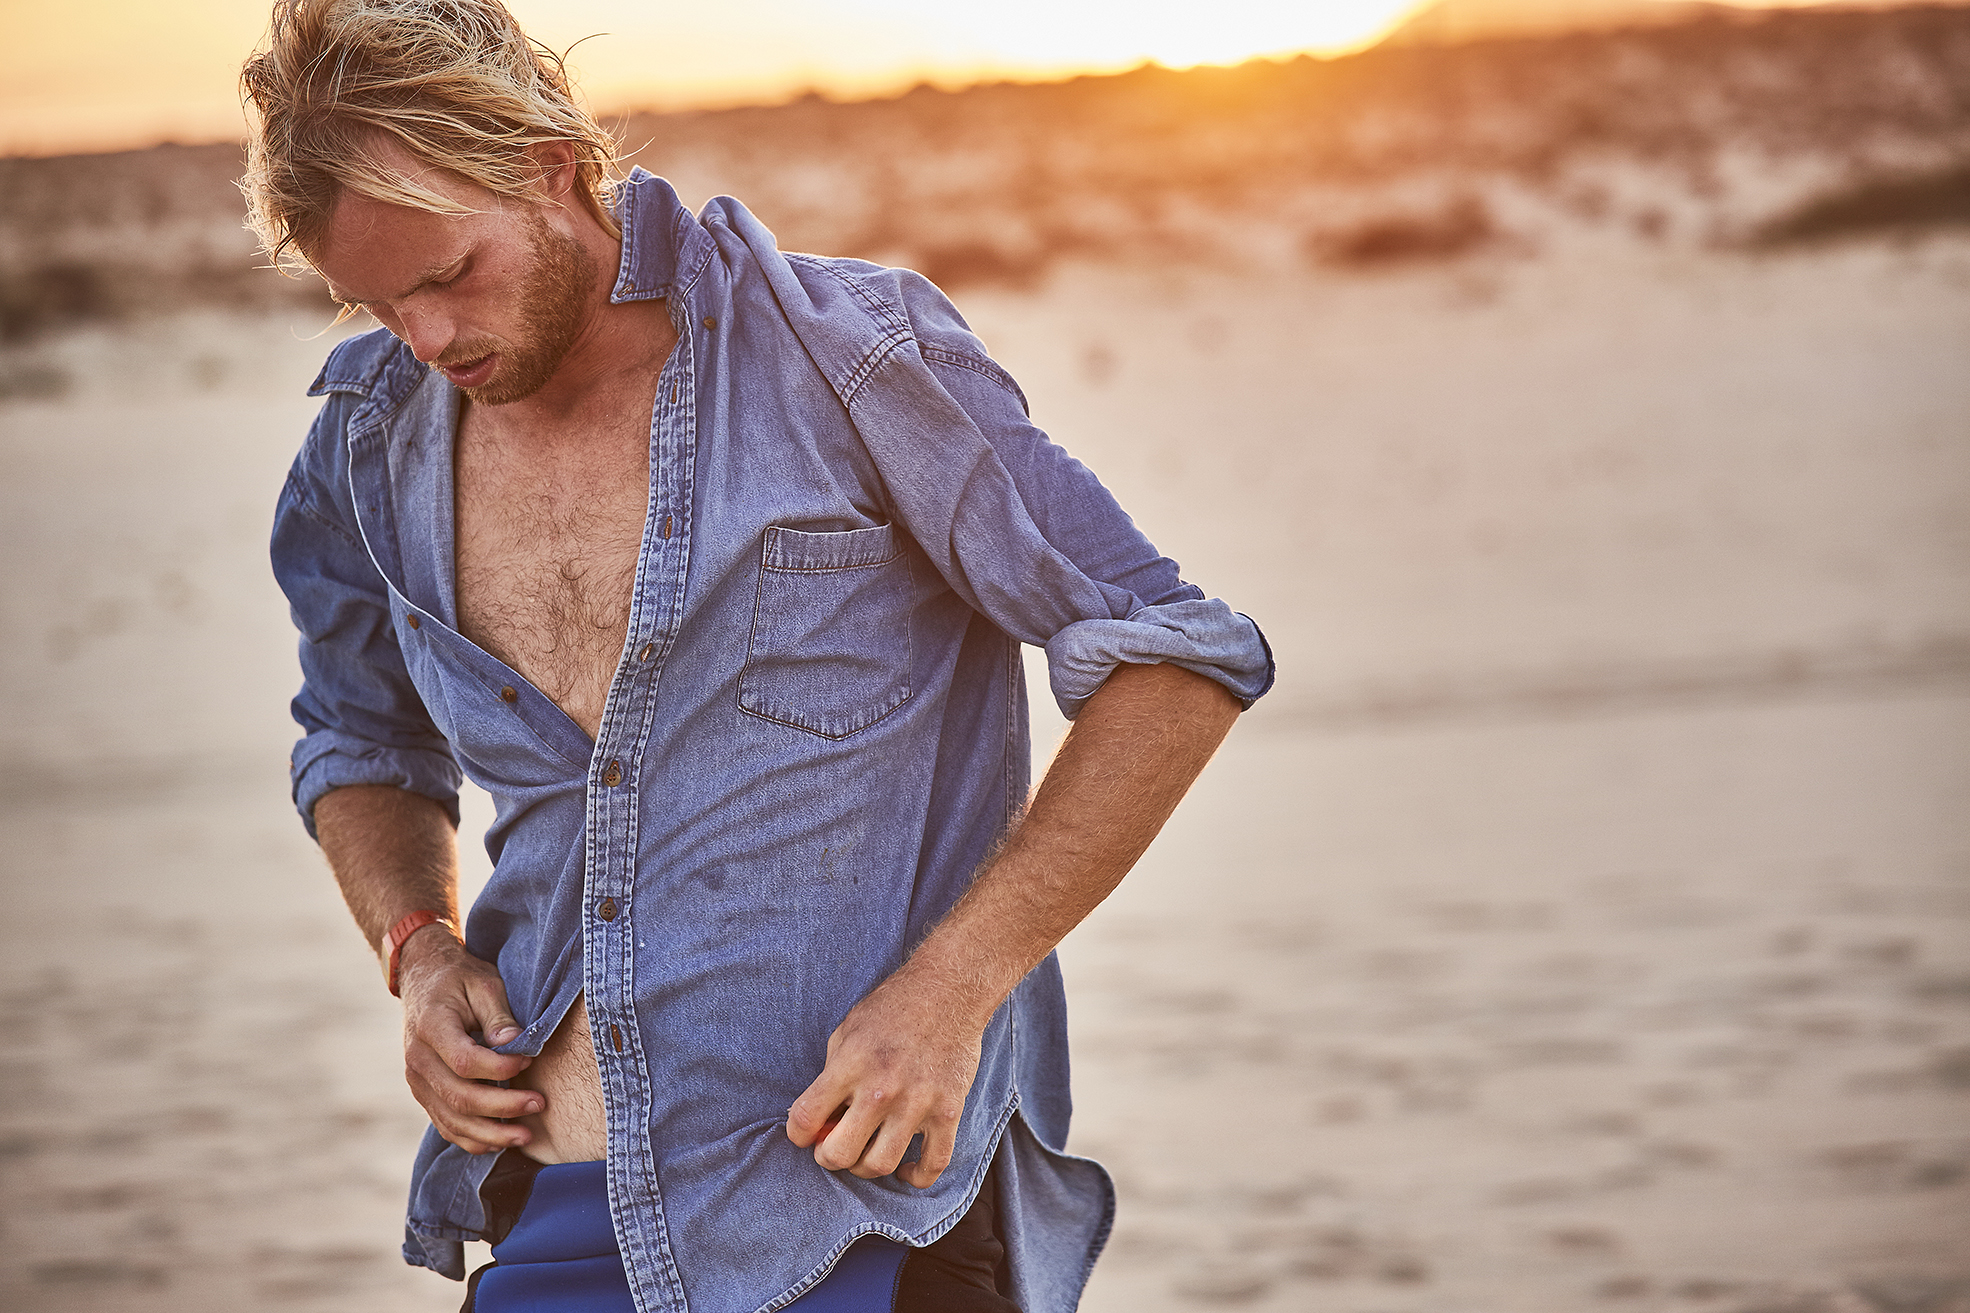 Surfer getting dressed after a sunset surf